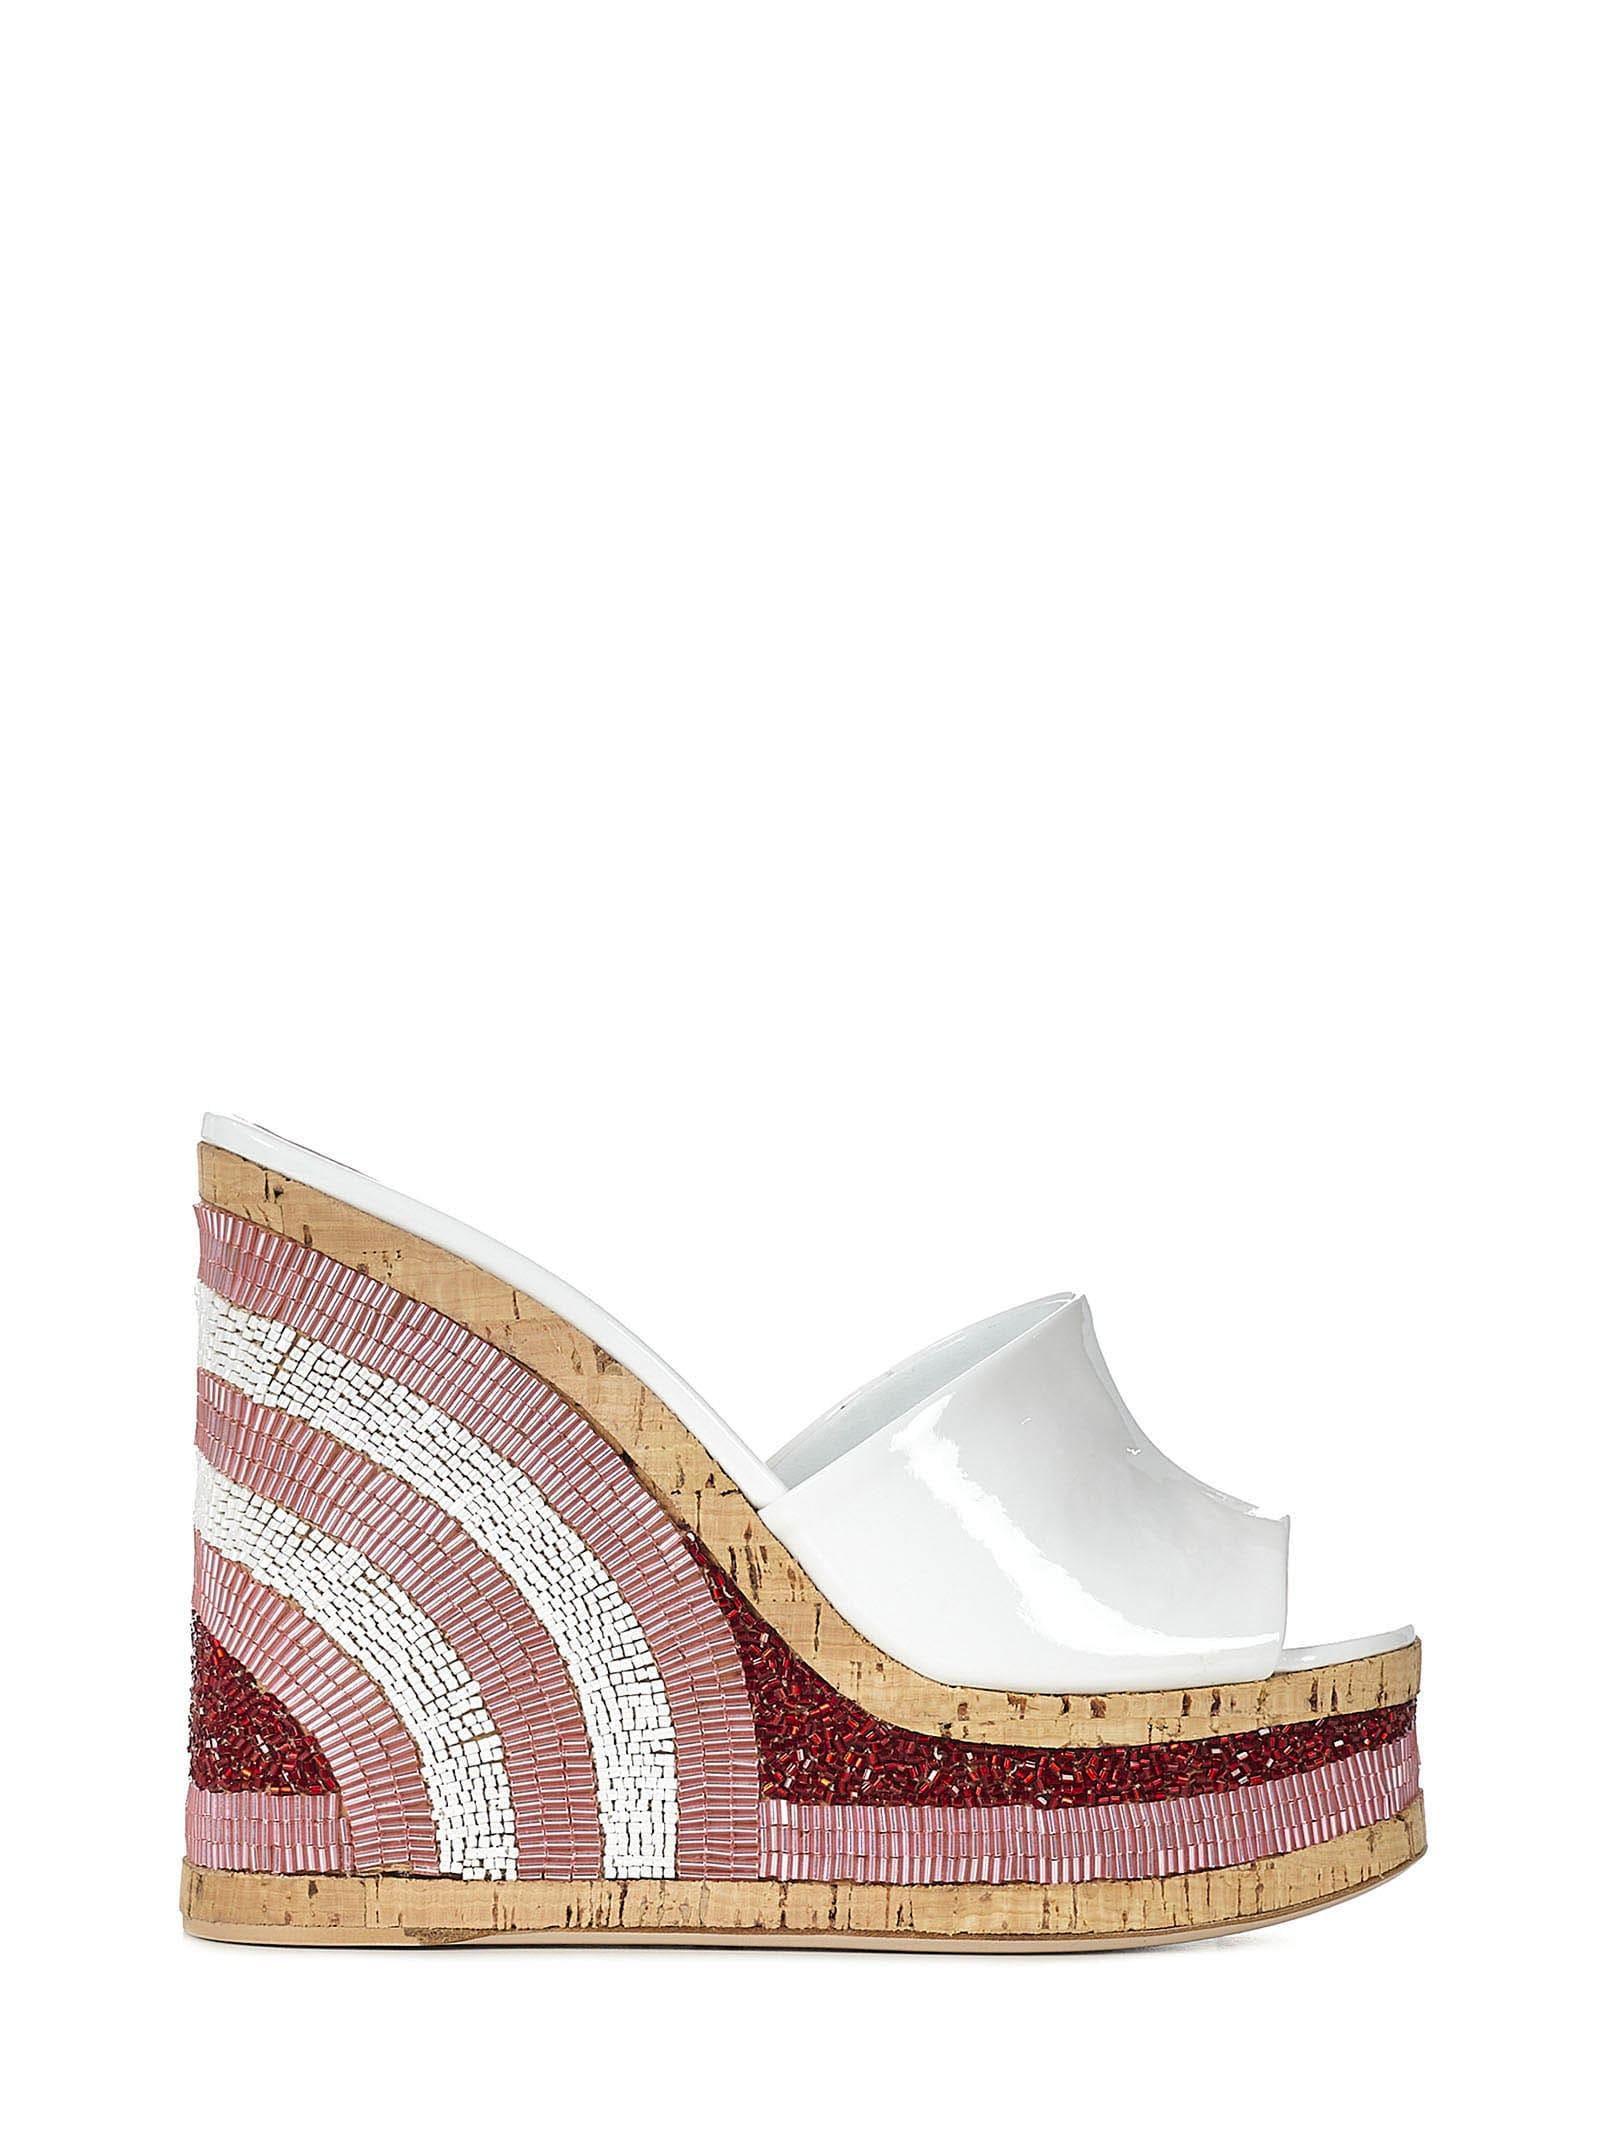 Lust Bead Sandals